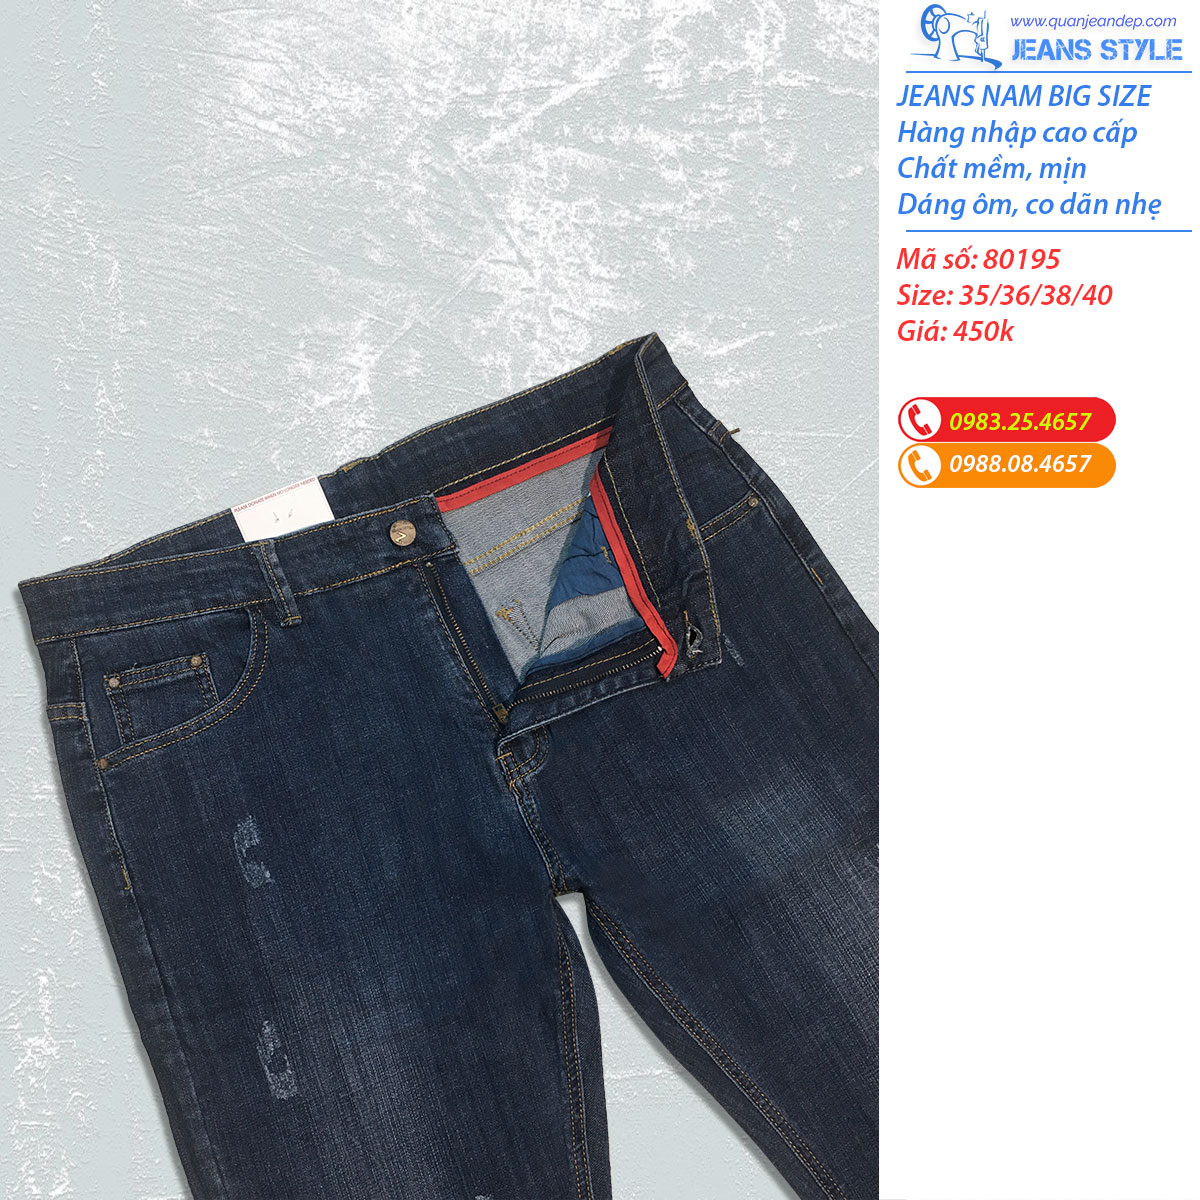 Jeans nam big size dáng ôm vừa 80195 Giá:450.000,00 ₫